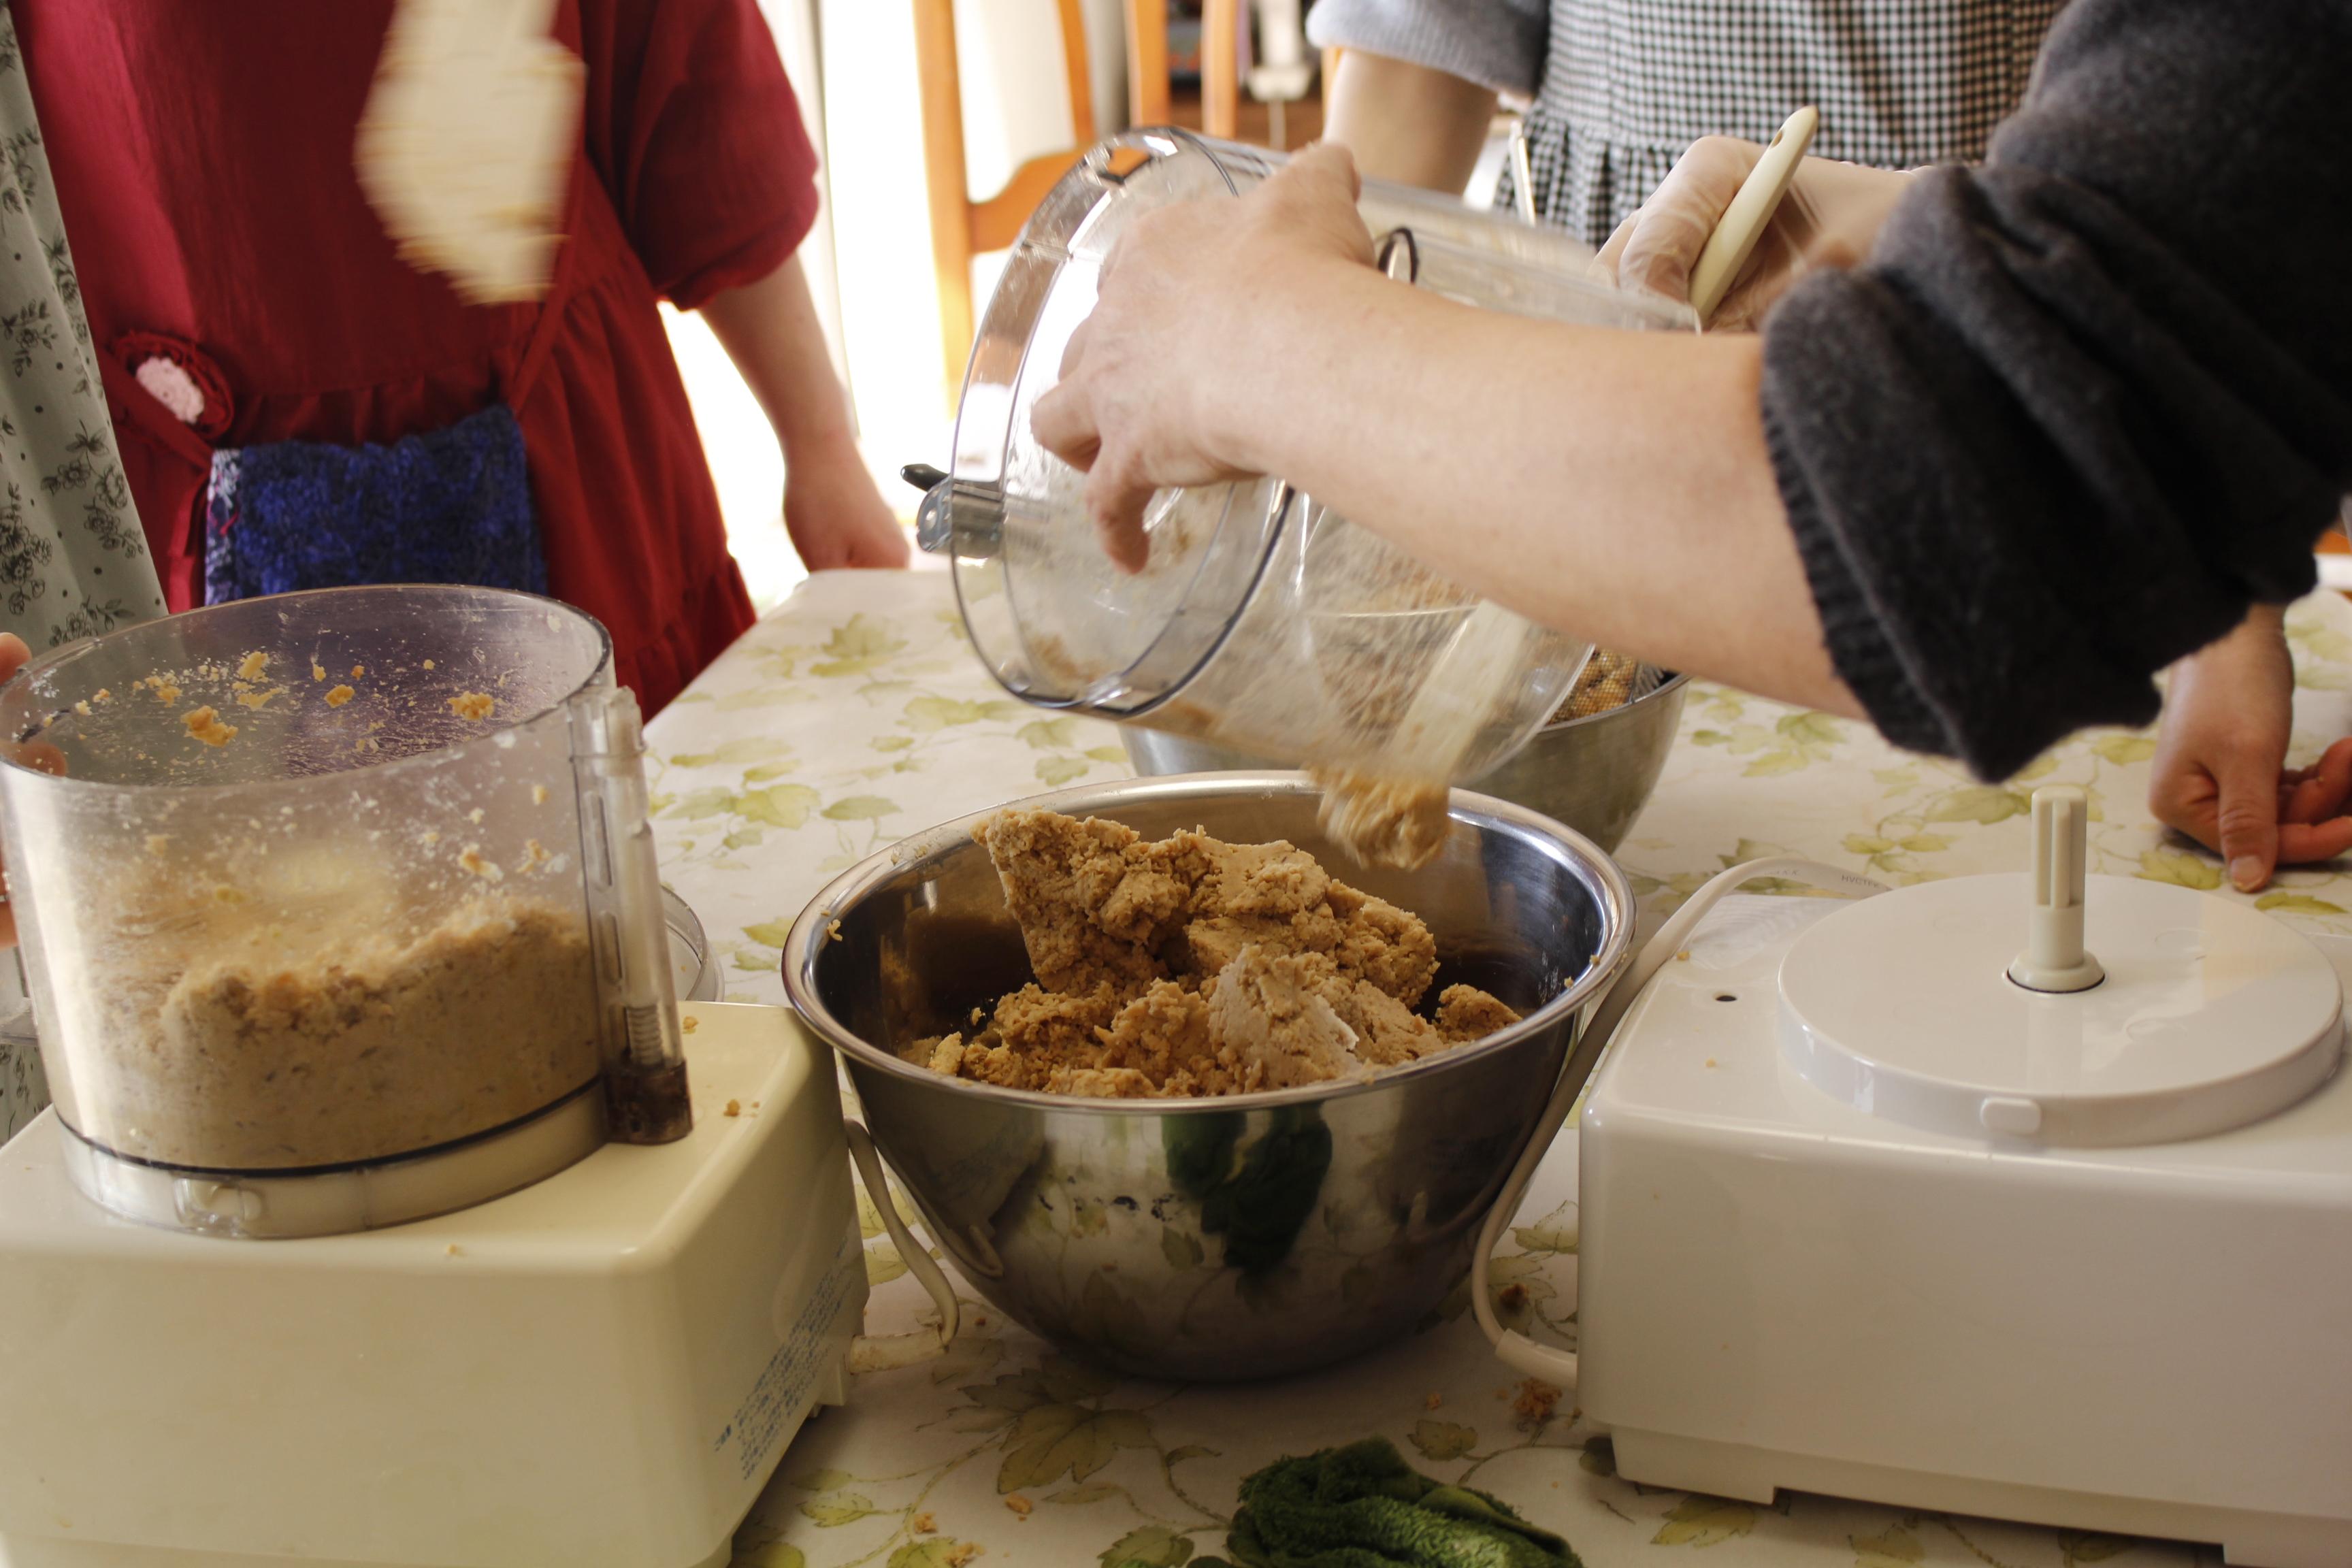 -ta-sante糖質制限パン料理教室。阿倍野区西田辺。2017年度味噌作り開始。手作り味噌レッスン2日目。